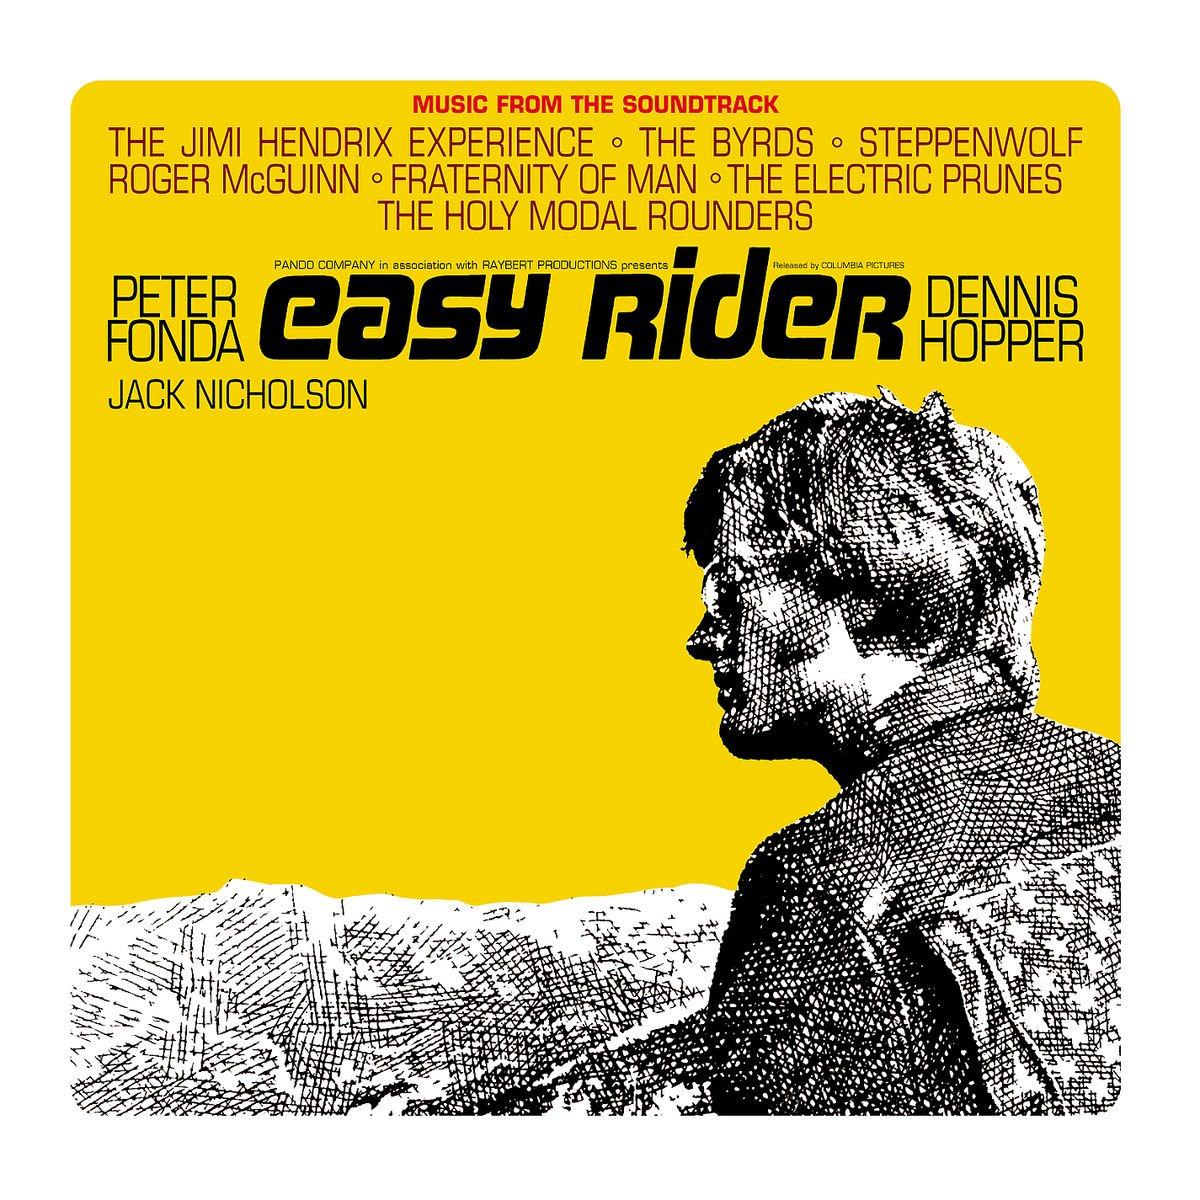 Double wedding soundtrack - Various Artists Various Artists Soundtracks Easy Rider Music From The Soundtrack 1969 Film Amazon Com Music